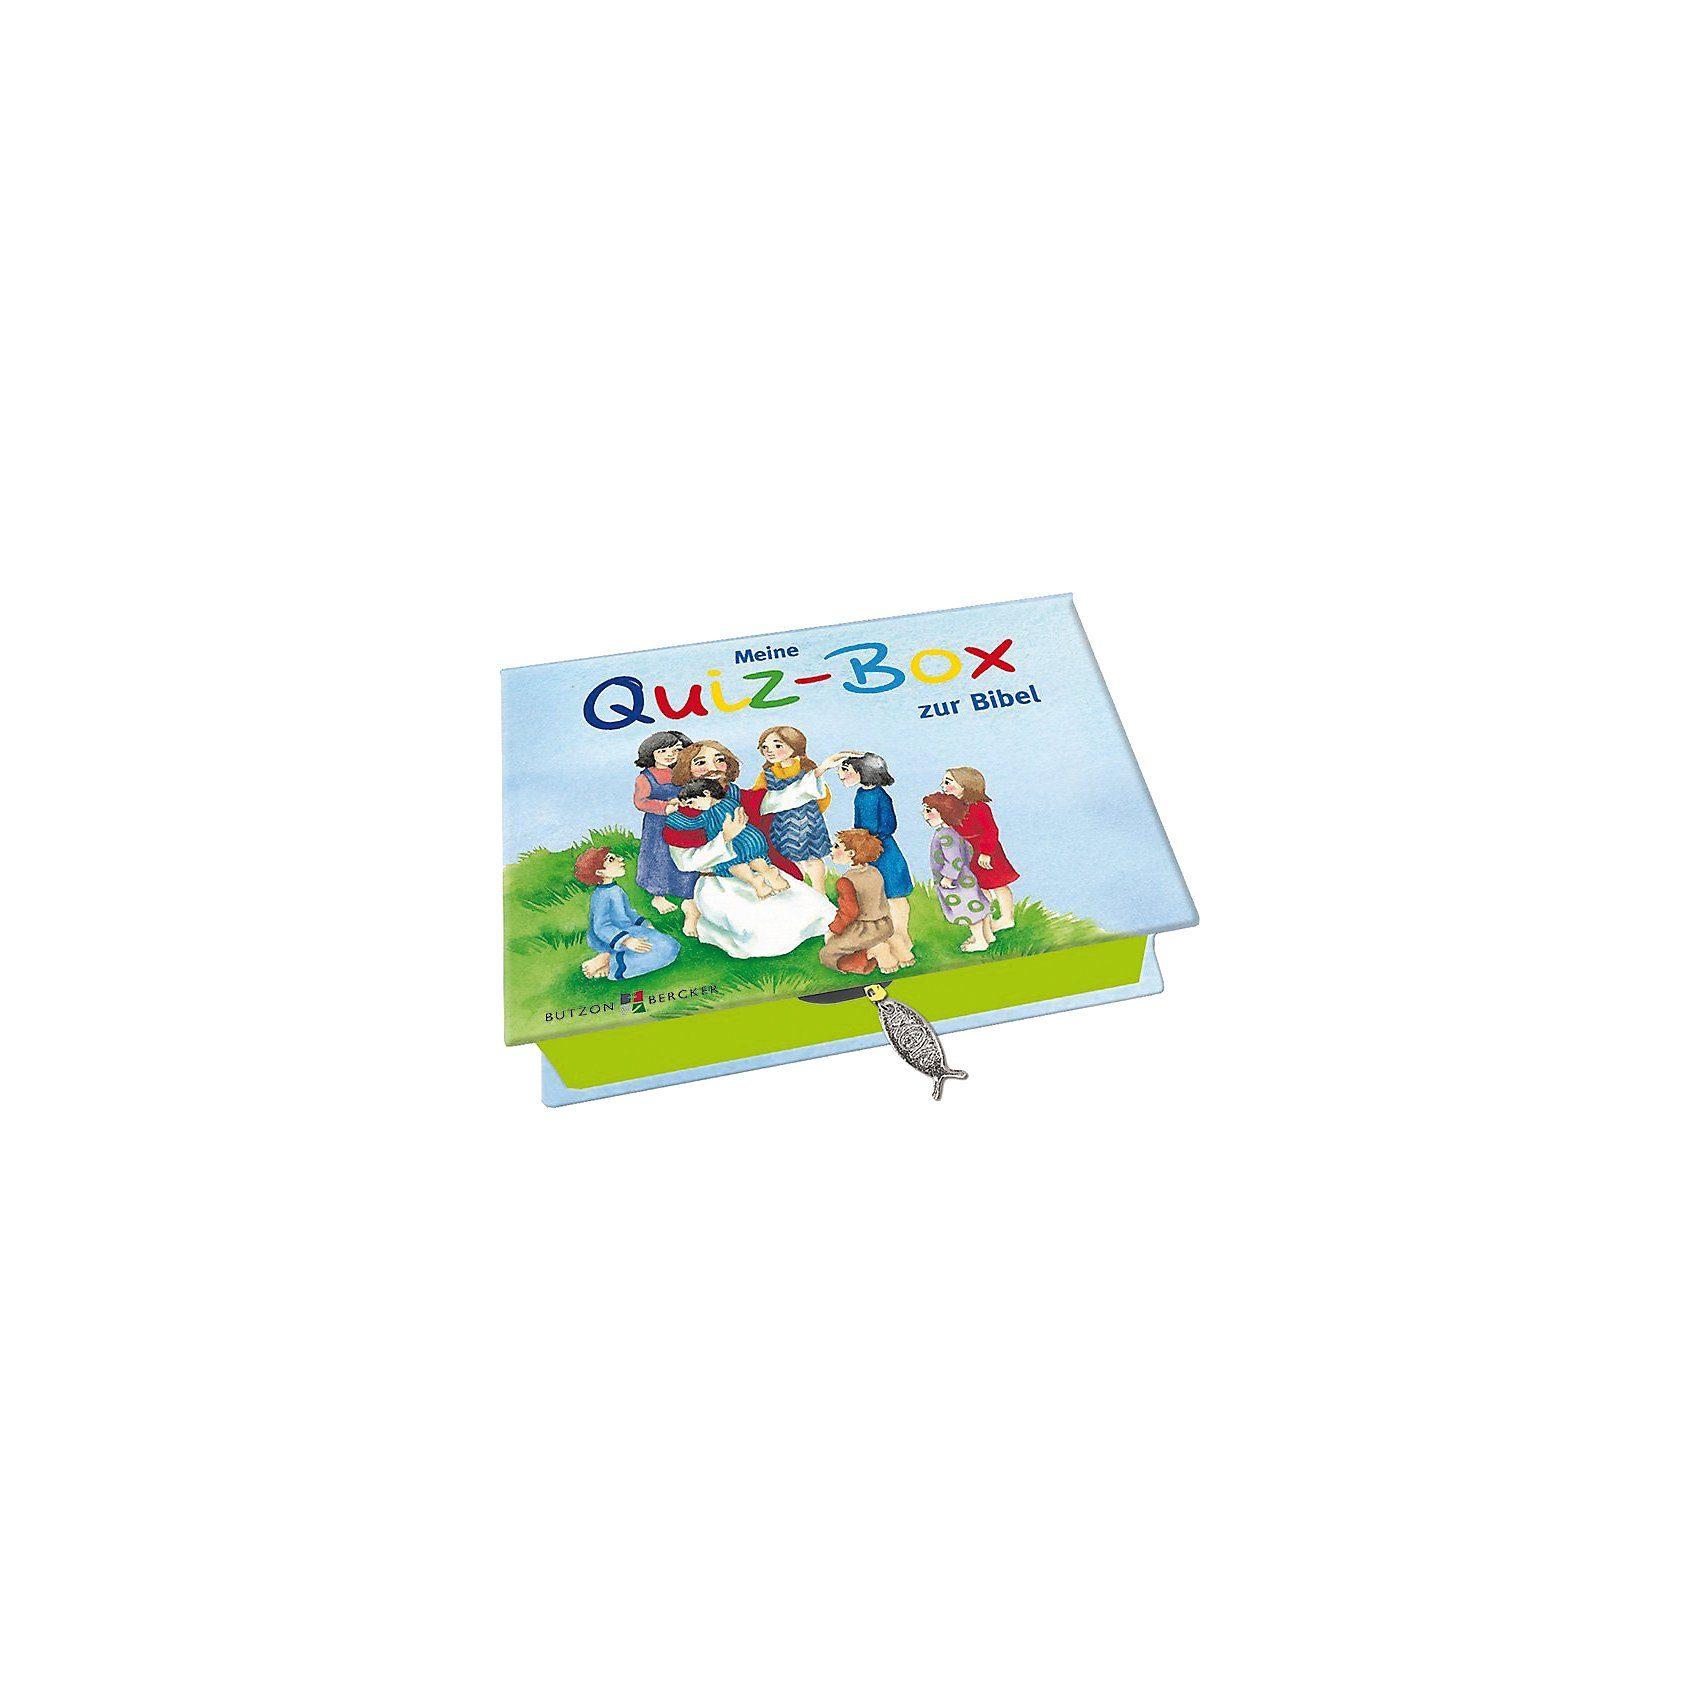 Butzon & Bercker Verlag Meine Quiz-Box zur Bibel